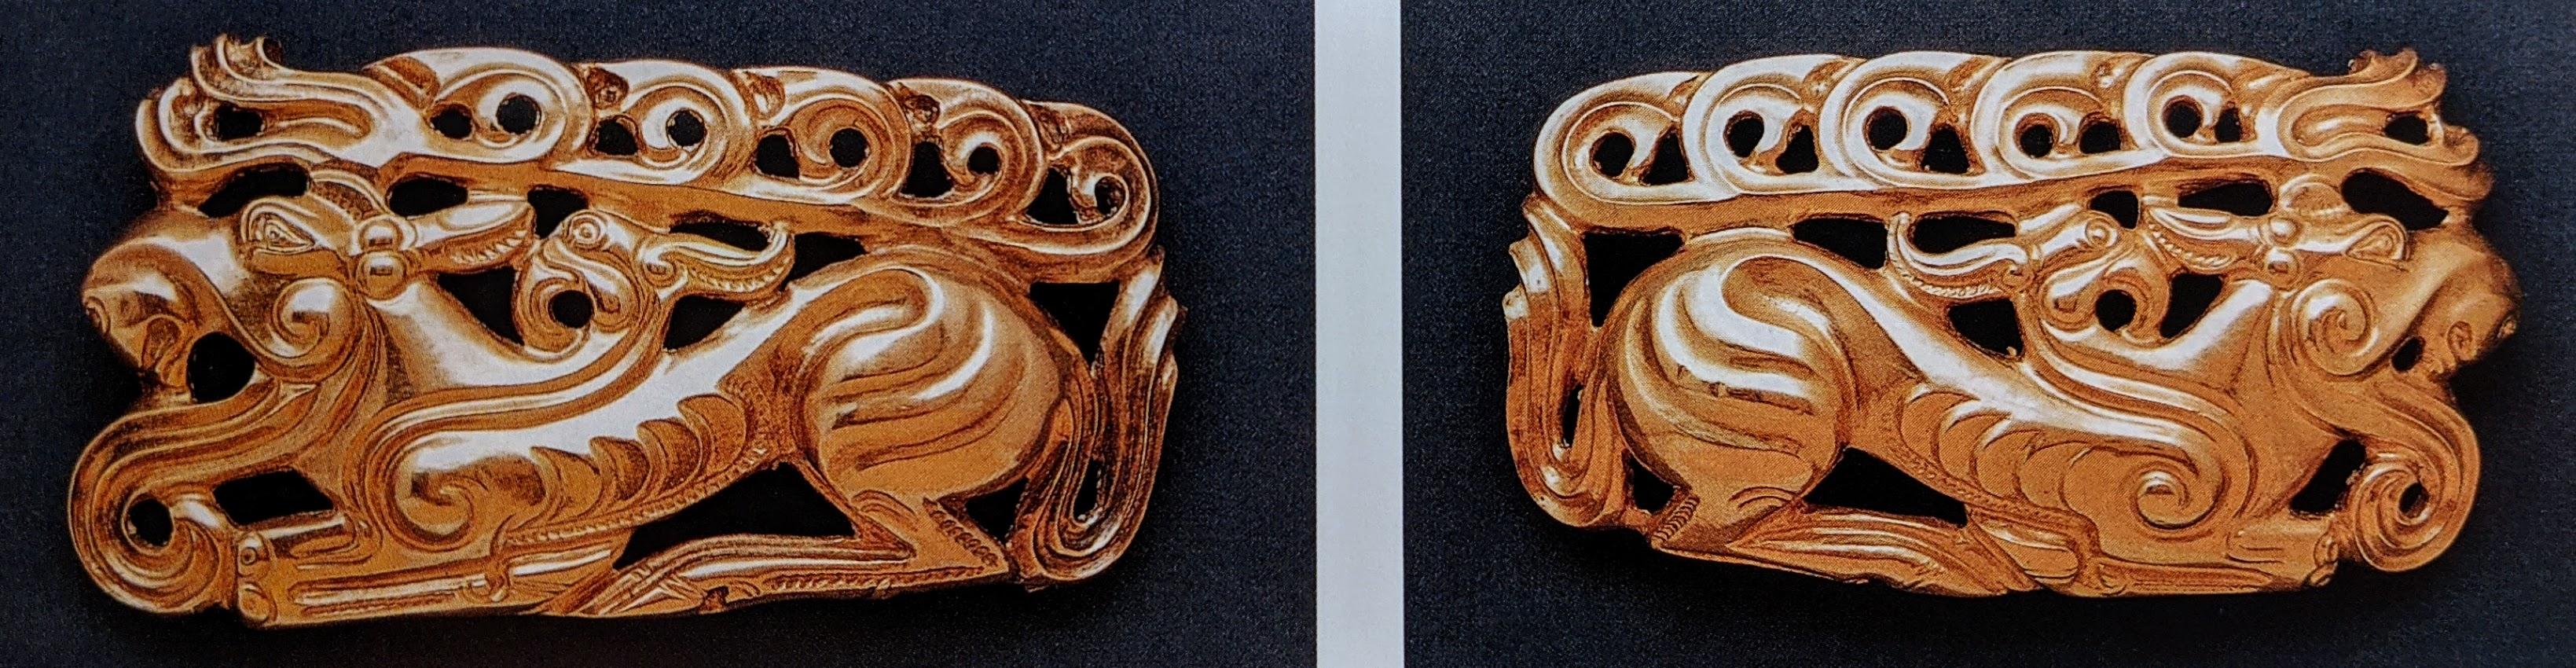 Stag chimera belt plaques